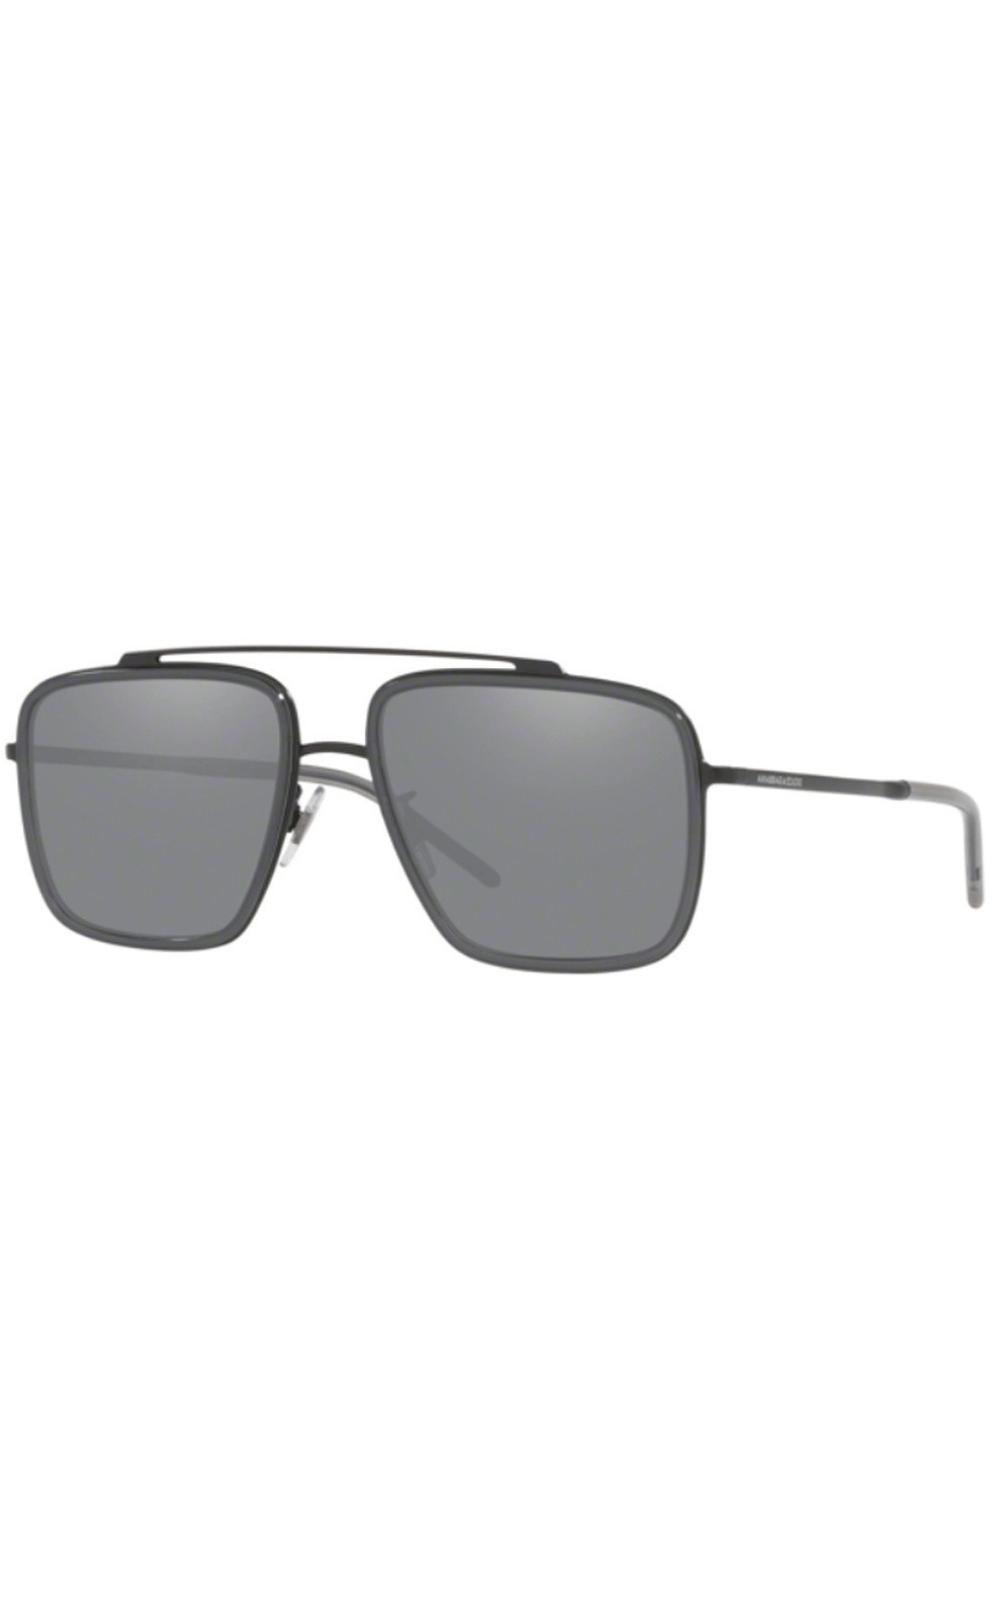 Foto 1 - Óculos de Sol Dolce & Gabbana Madison 22201106/6G